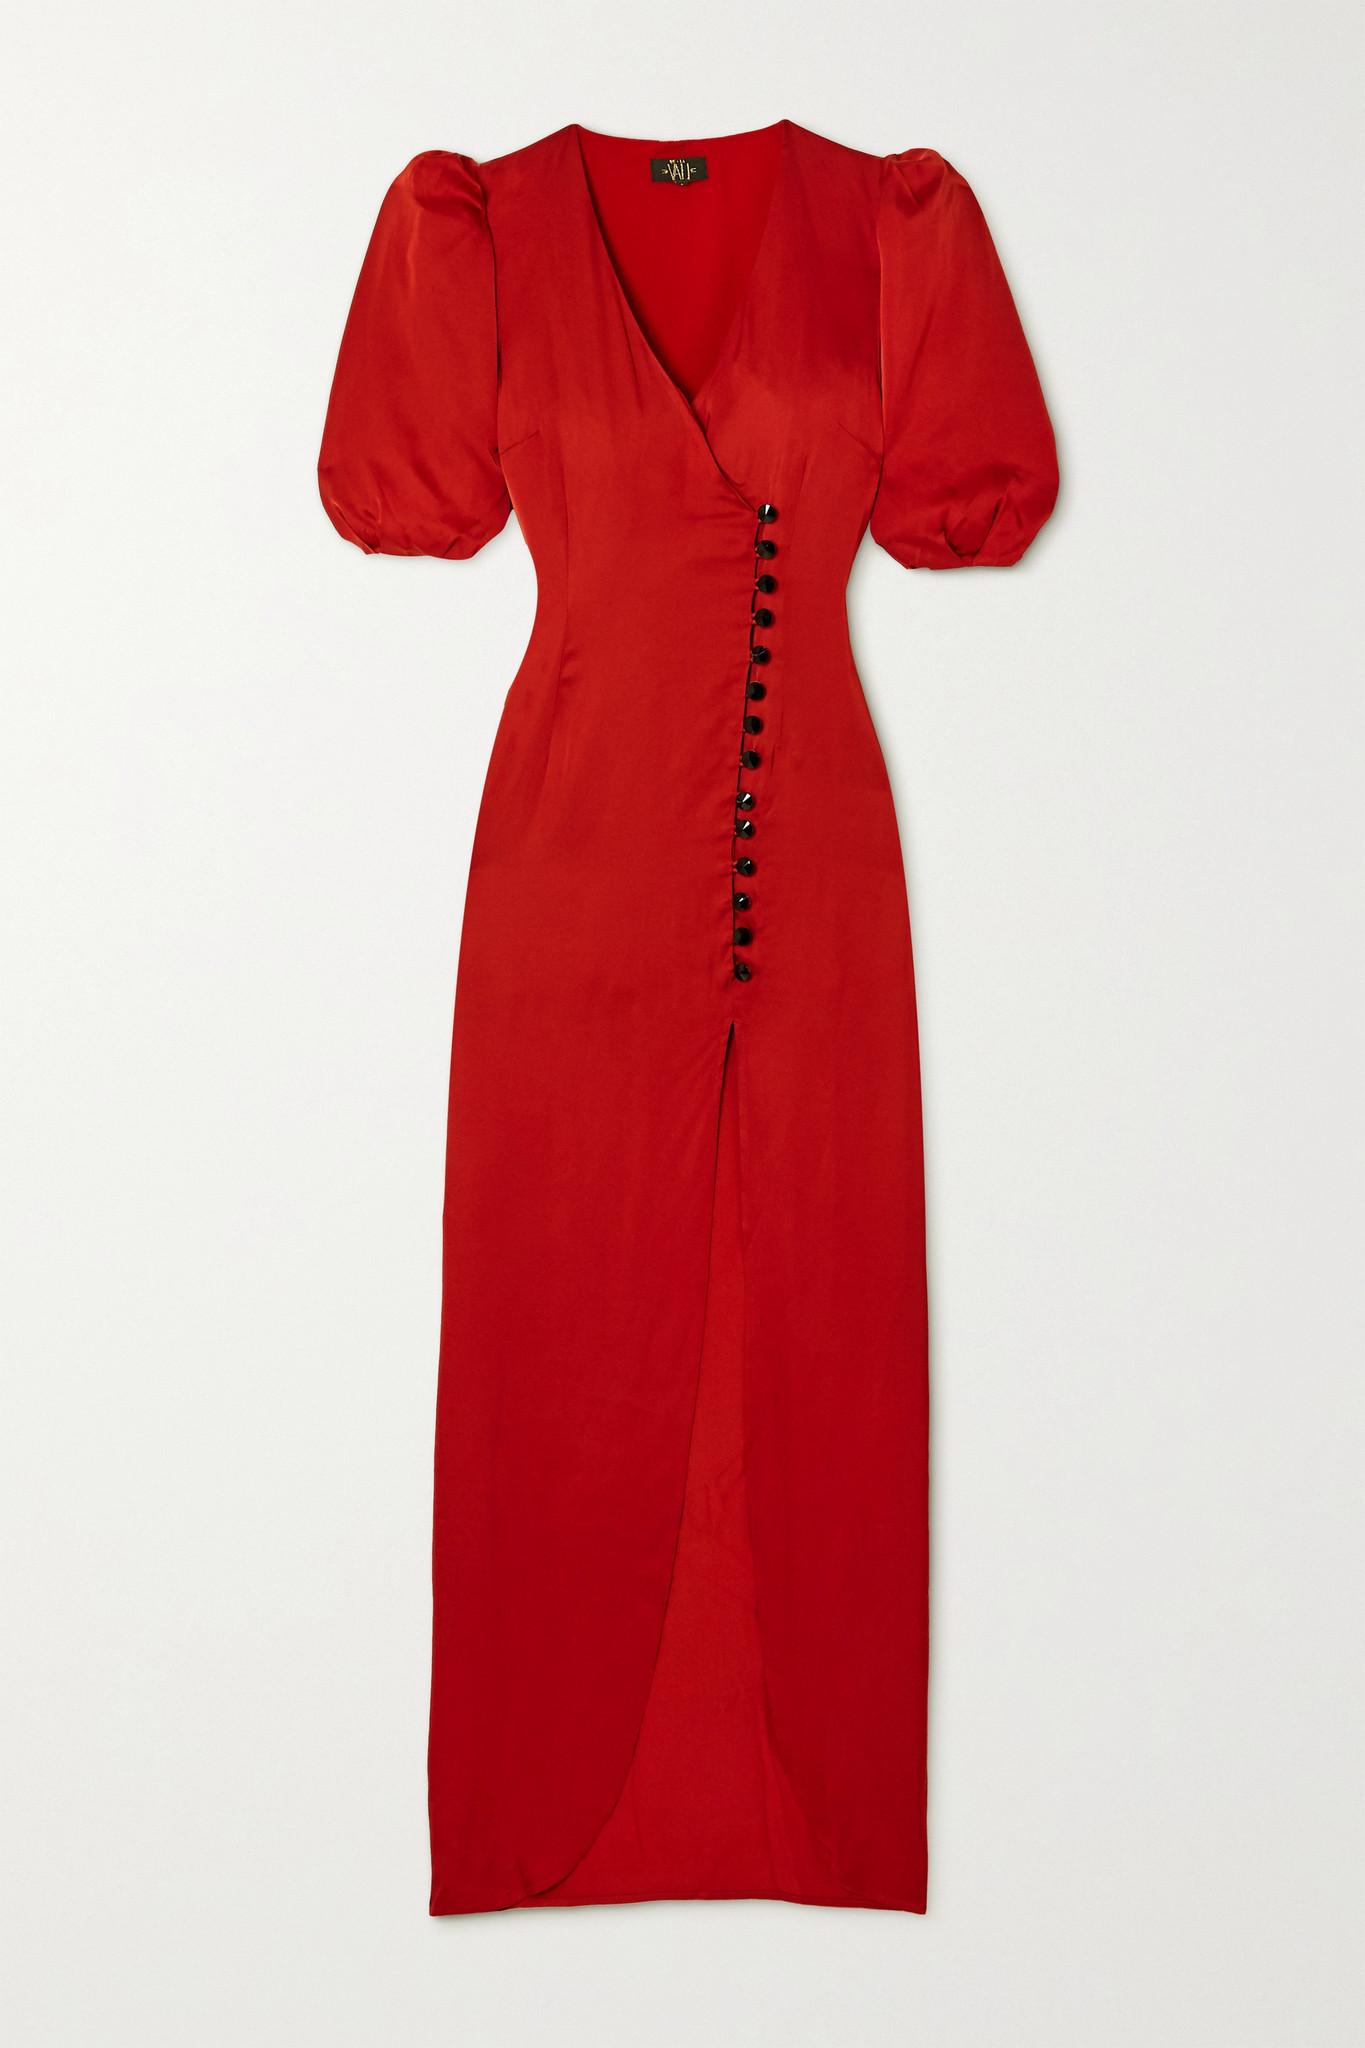 DE LA VALI - Ohio Crystal-embellished Satin Maxi Dress - Burgundy - UK10